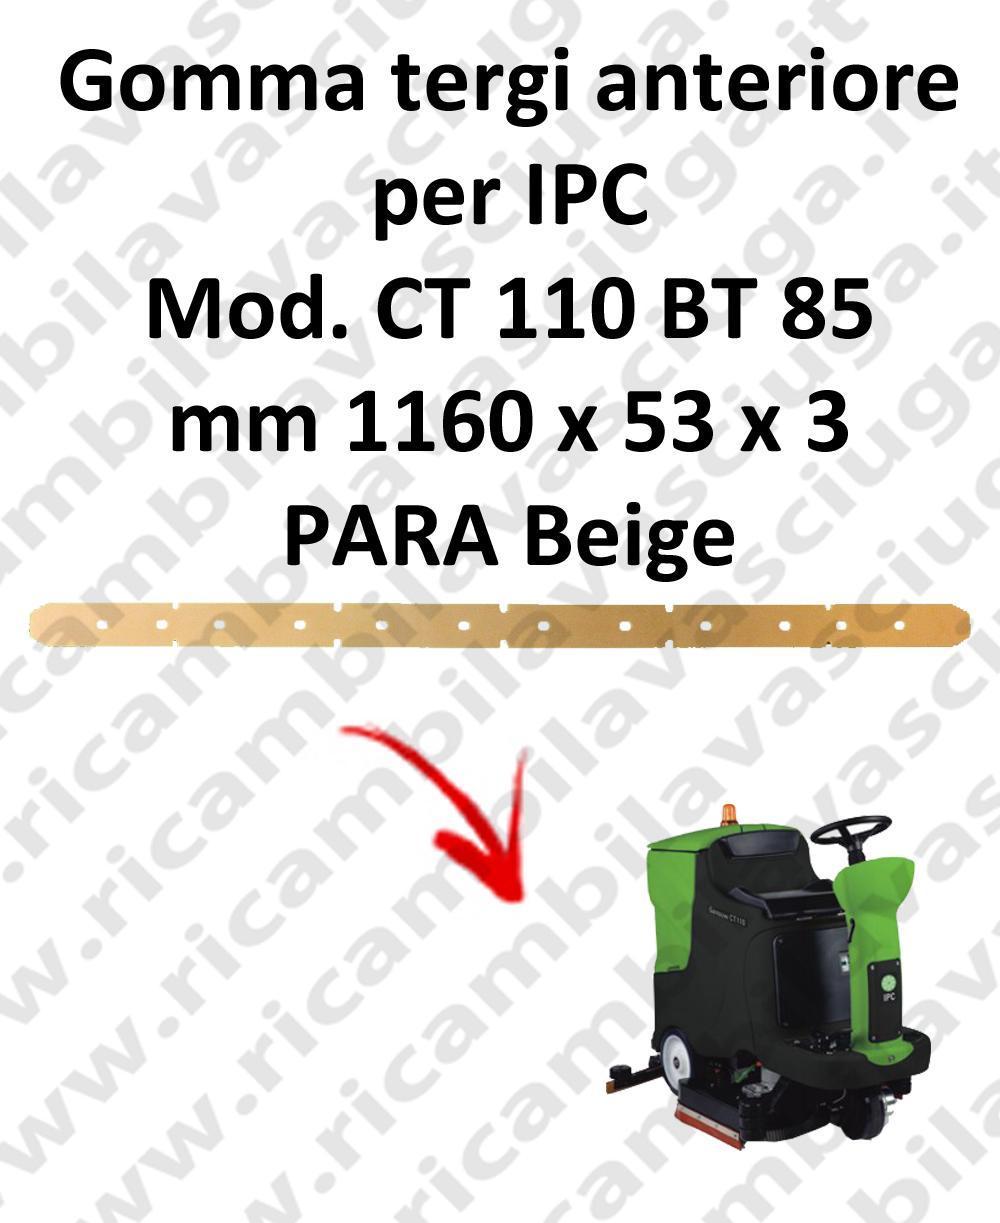 goma de secado delantera para fregadora IPC Model CT 110 BT 85